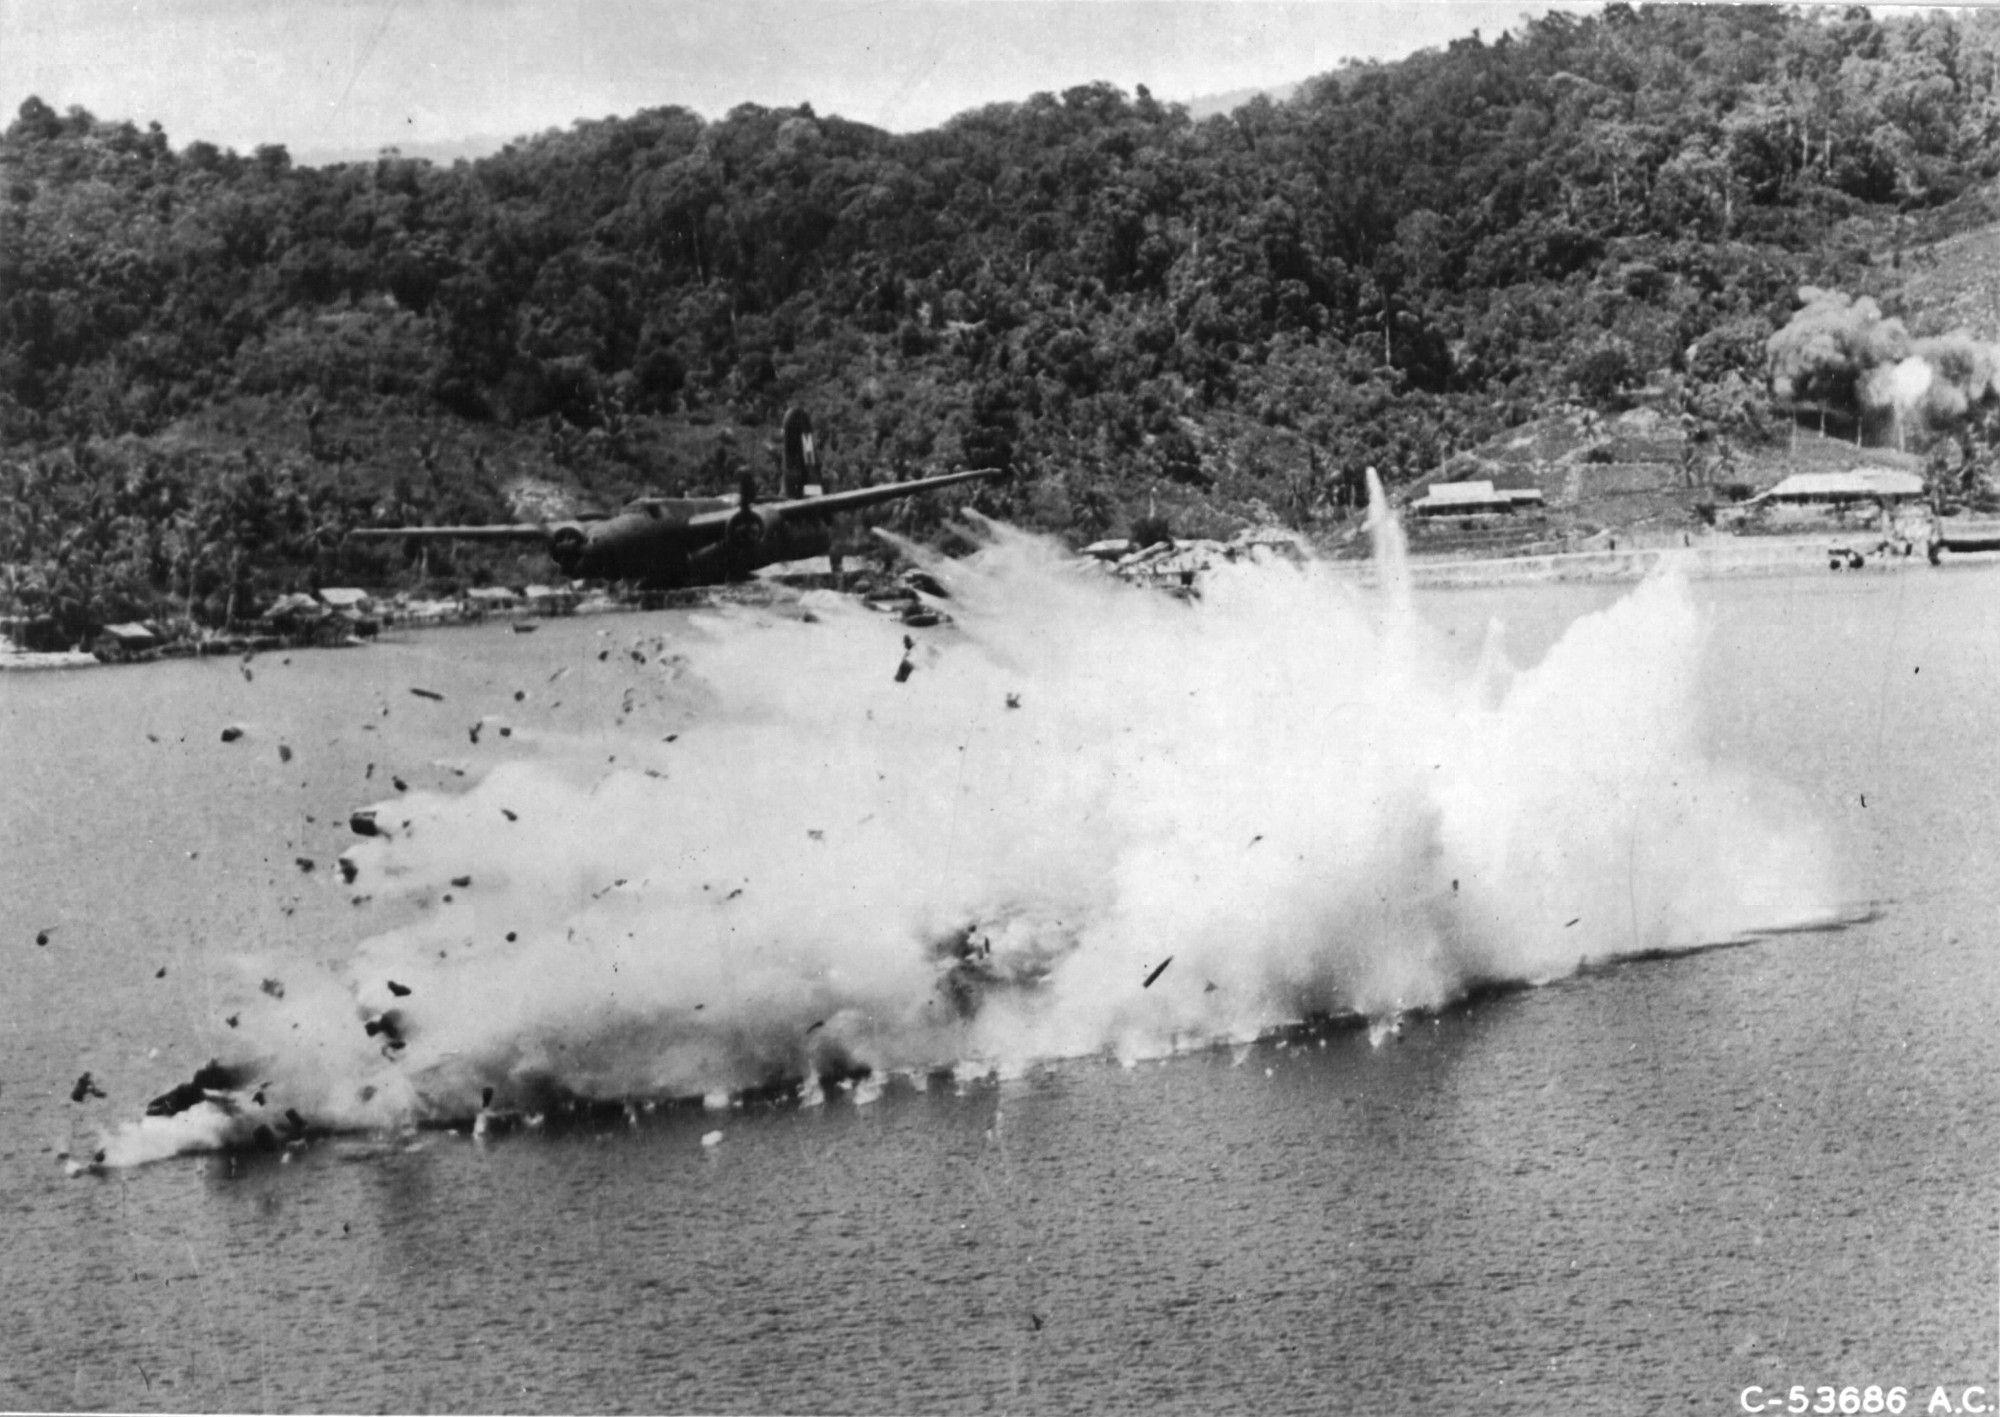 Douglas-A-20-22-July-1944-photo-3.jpg